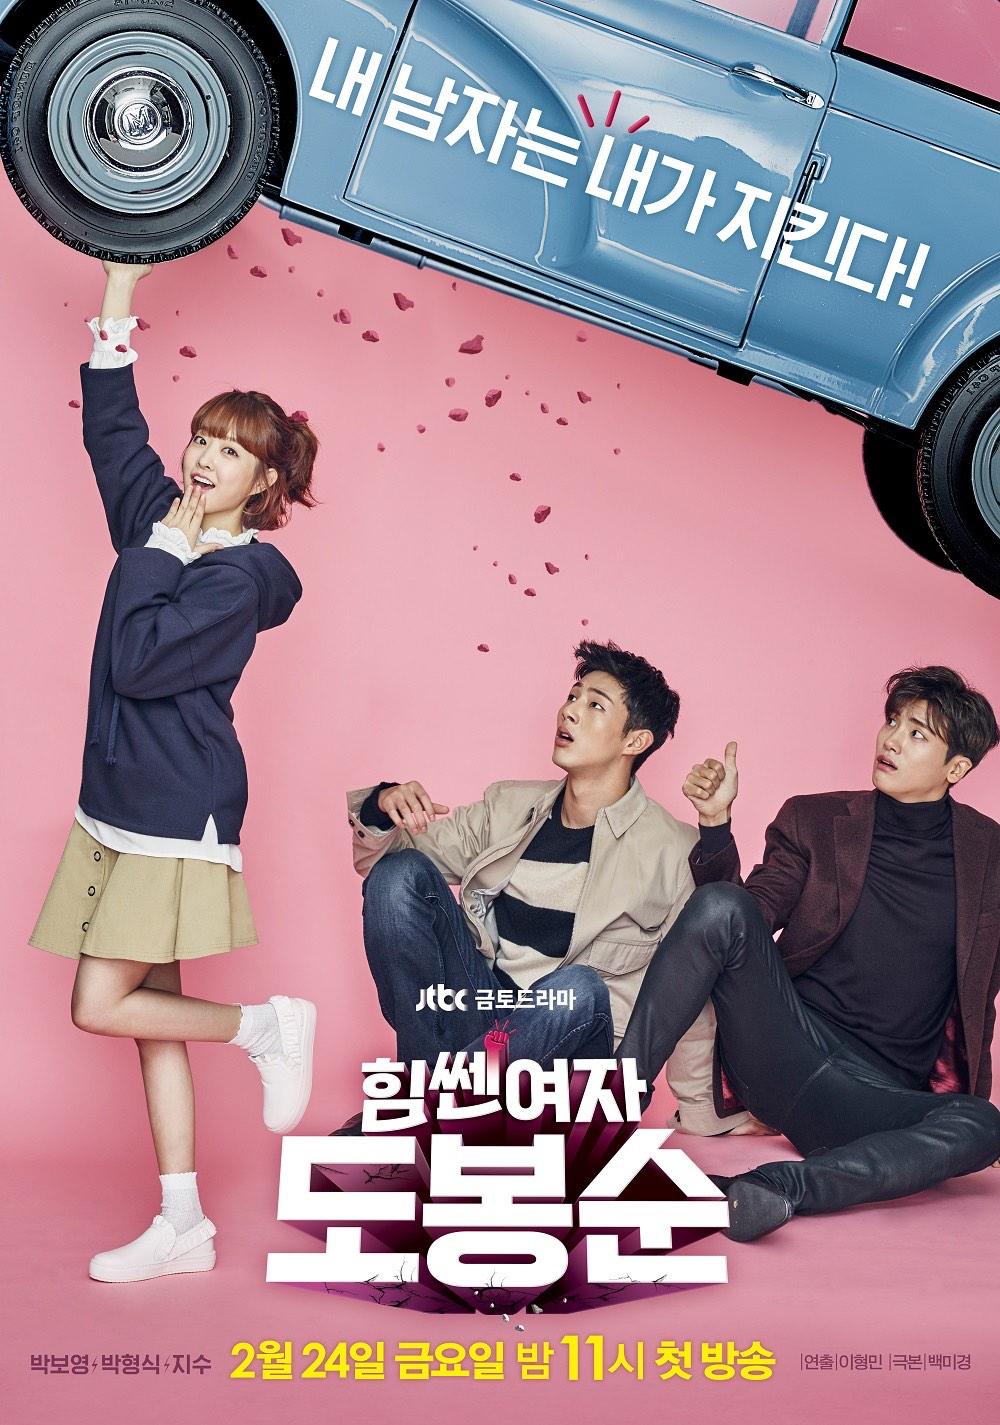 Him-ssen yeo-ja Do Bong-soon (TV Series 2017) - IMDb